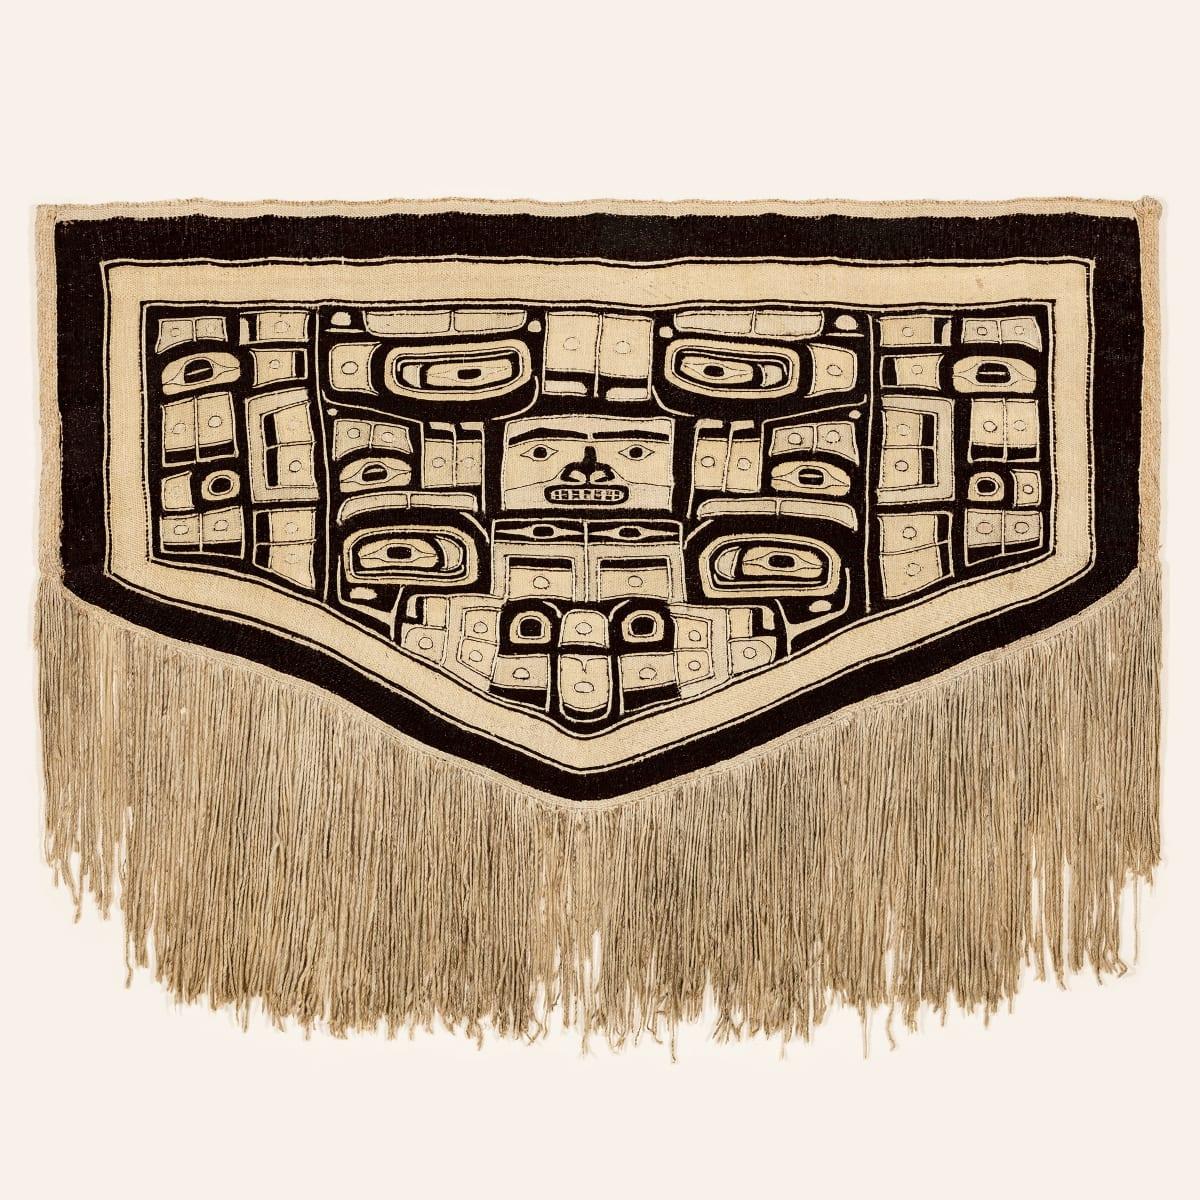 UNIDENTIFIED ARTIST, TLINGIT, CHILKAT KWAAN Chilkat Robe (Naaxein), c. 1880 ESTIMATE: $25,000 — $35,000 PRICE REALIZED: $26,400